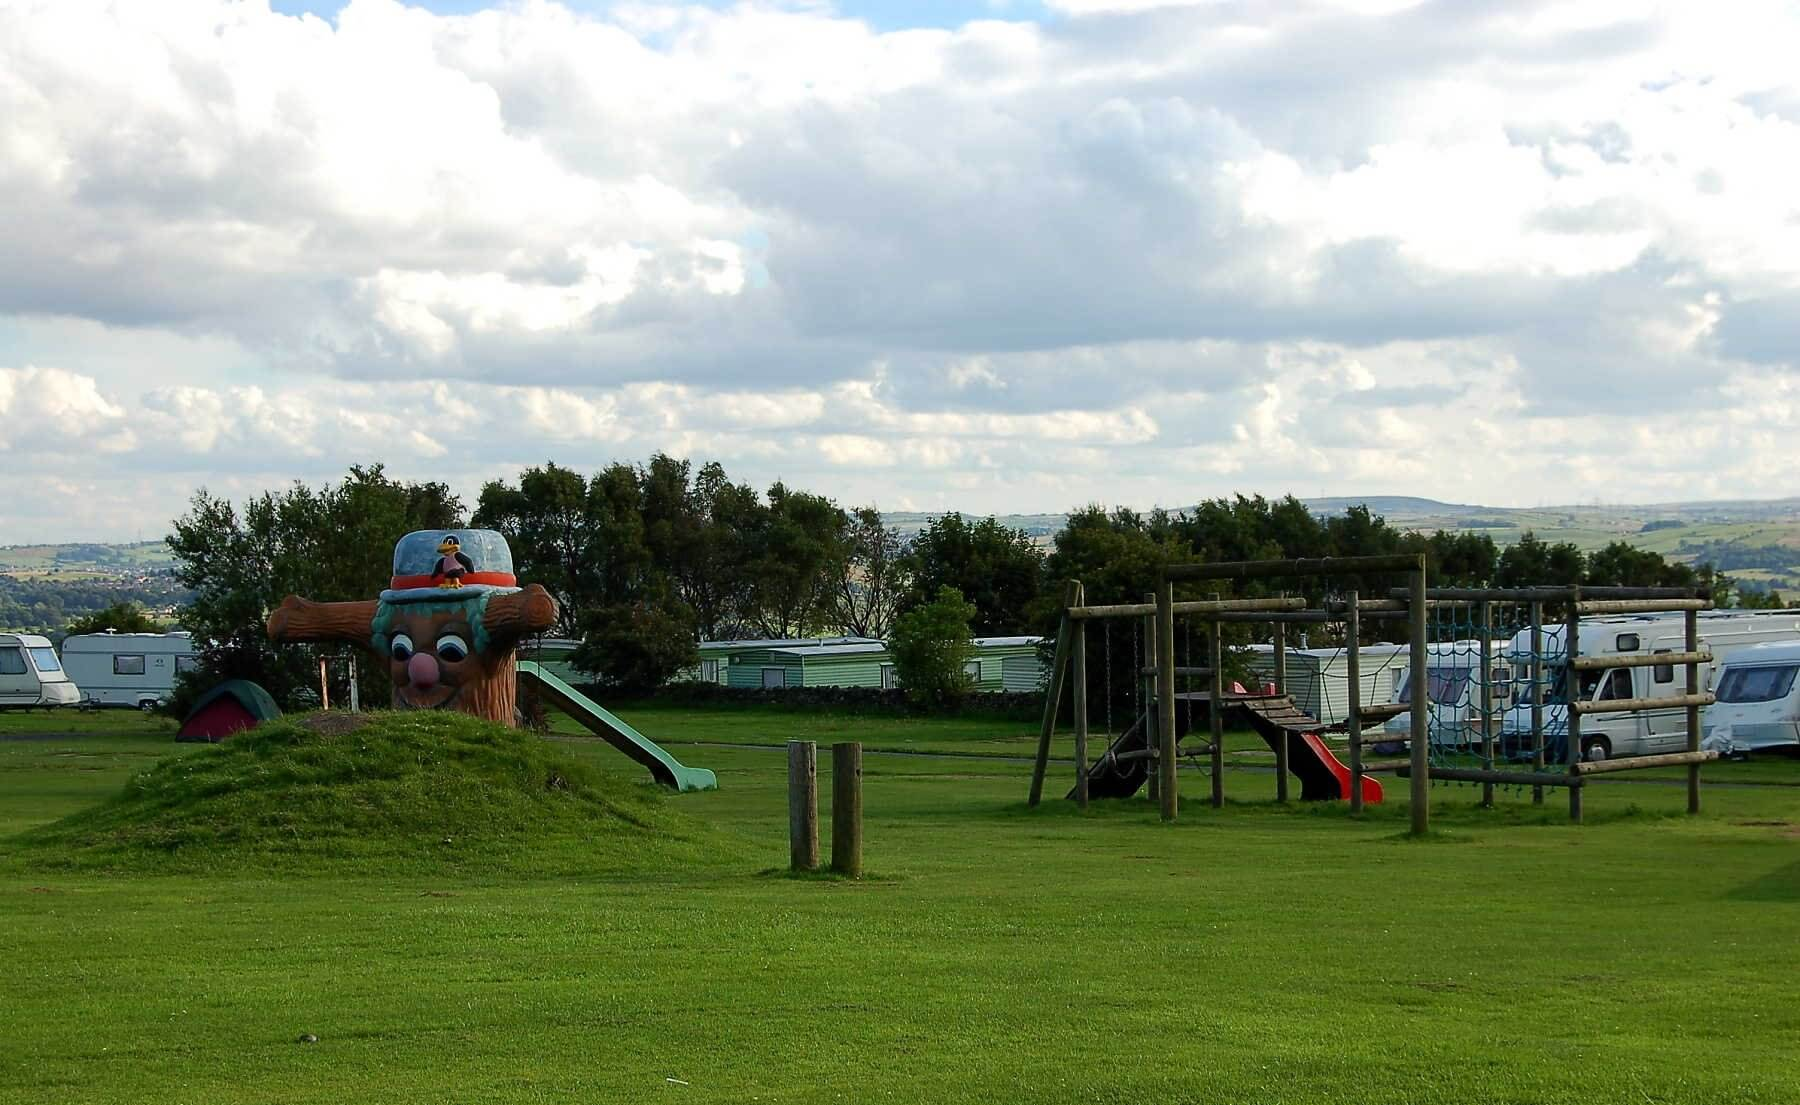 Dobrudden Caravan Park, Shipley, West Yorkshire | Head Outside